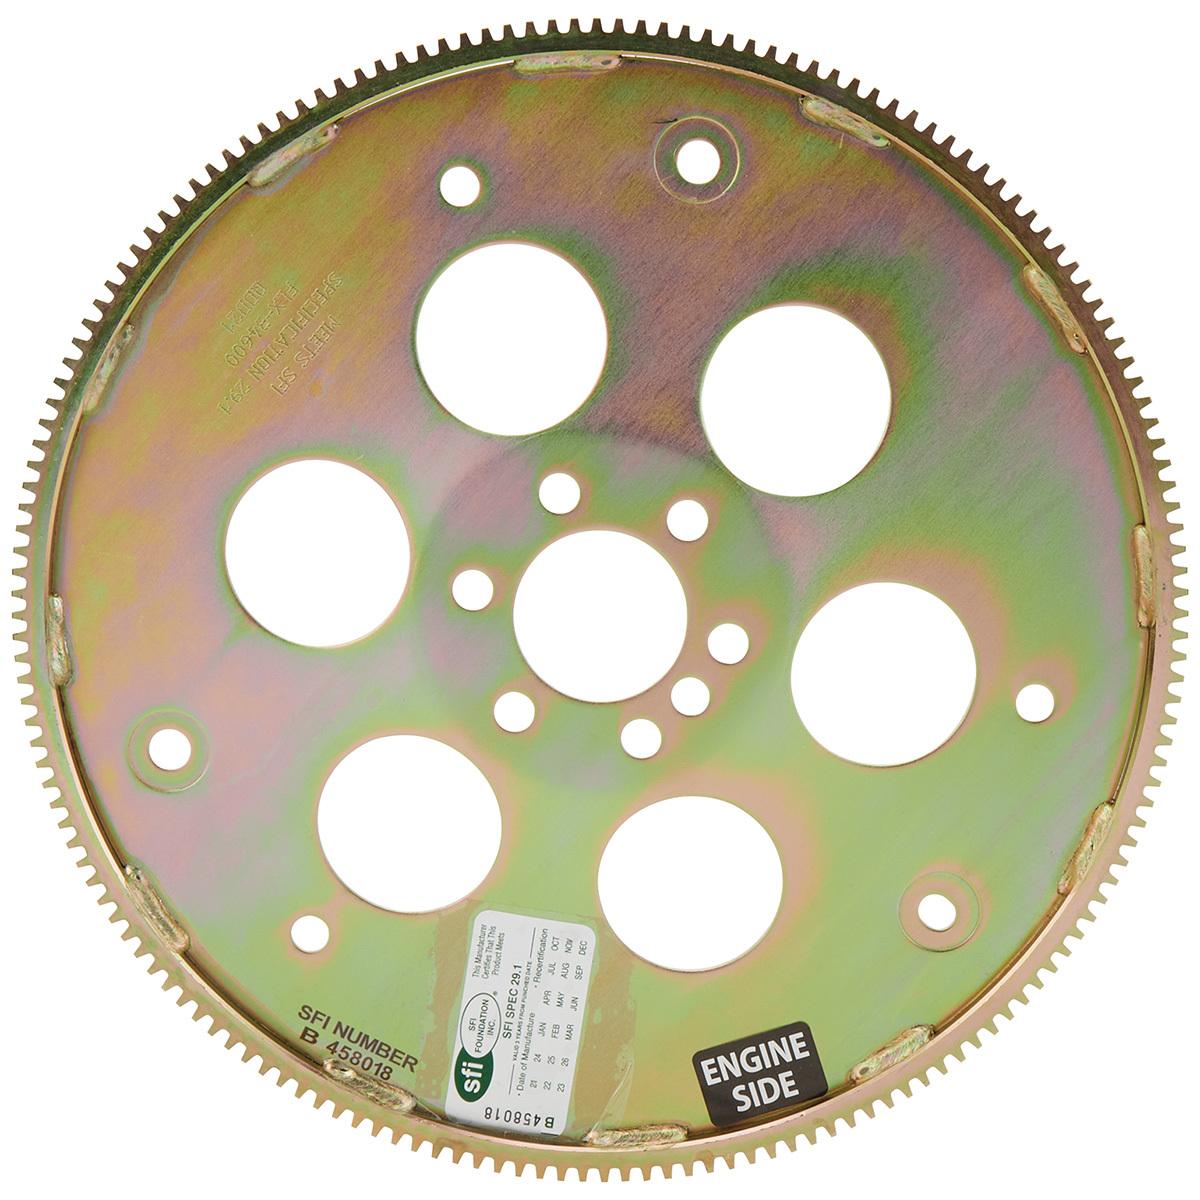 Allstar Performance 26840 Flexplate, 168 Tooth, SFI 29.1, Steel, Internal Balance, 1 Piece Seal, GM LS-Series, Each